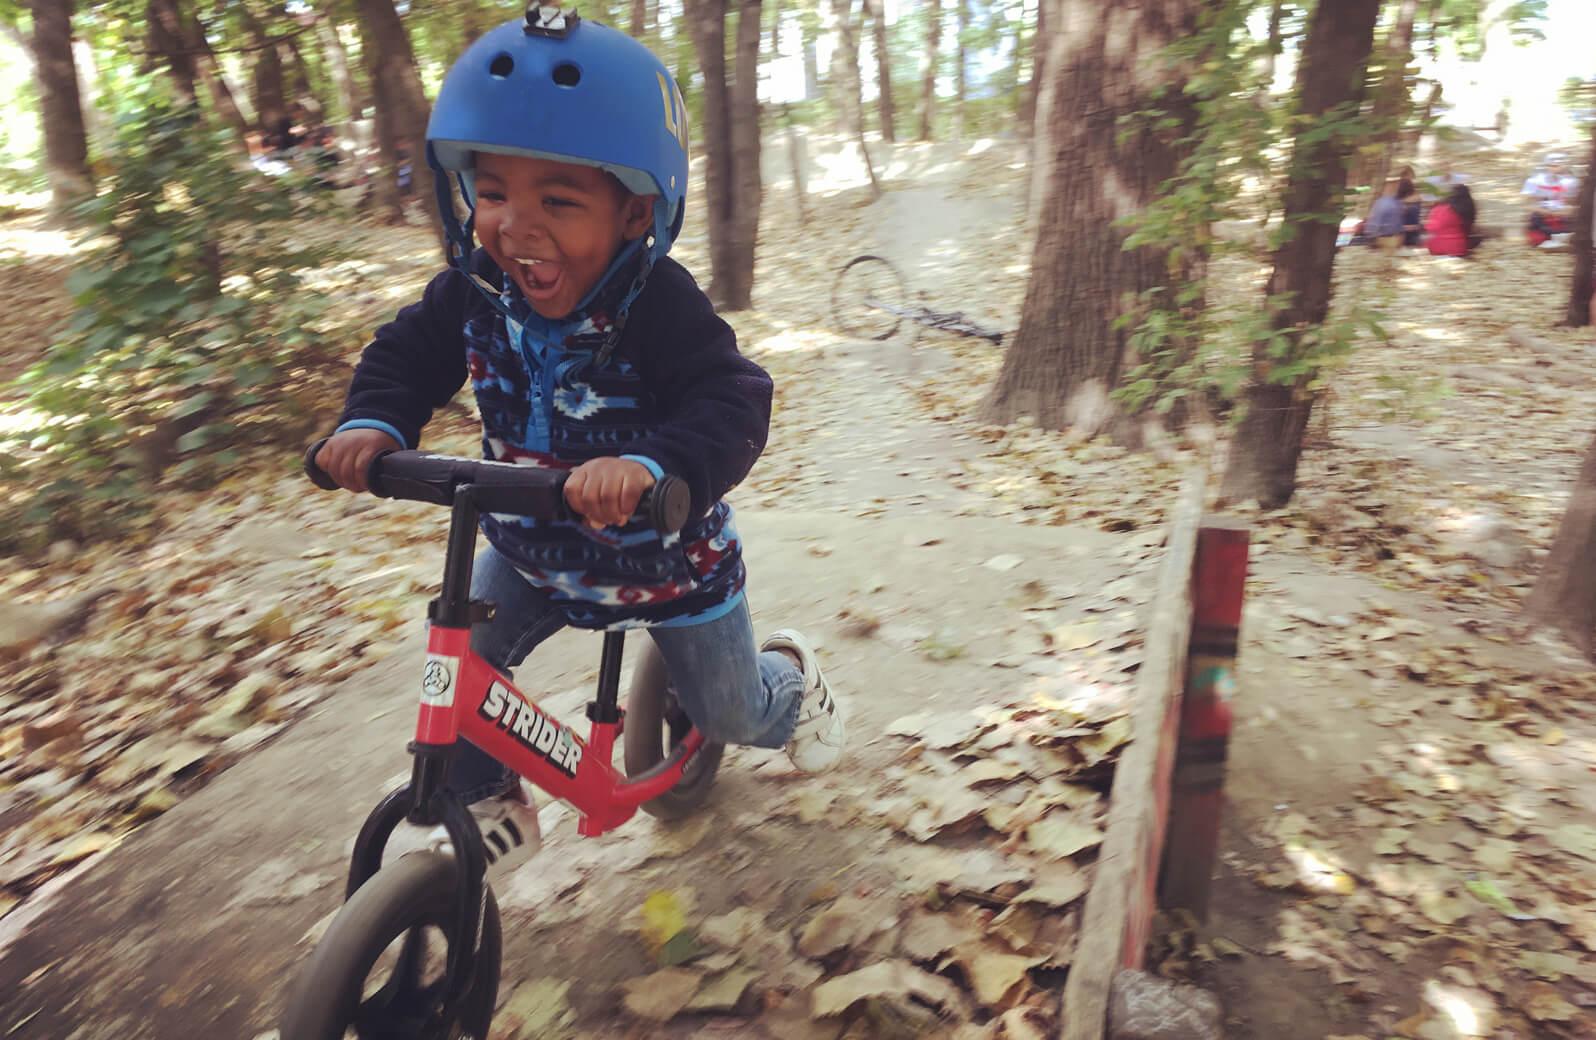 strider balance bikes be adventurous